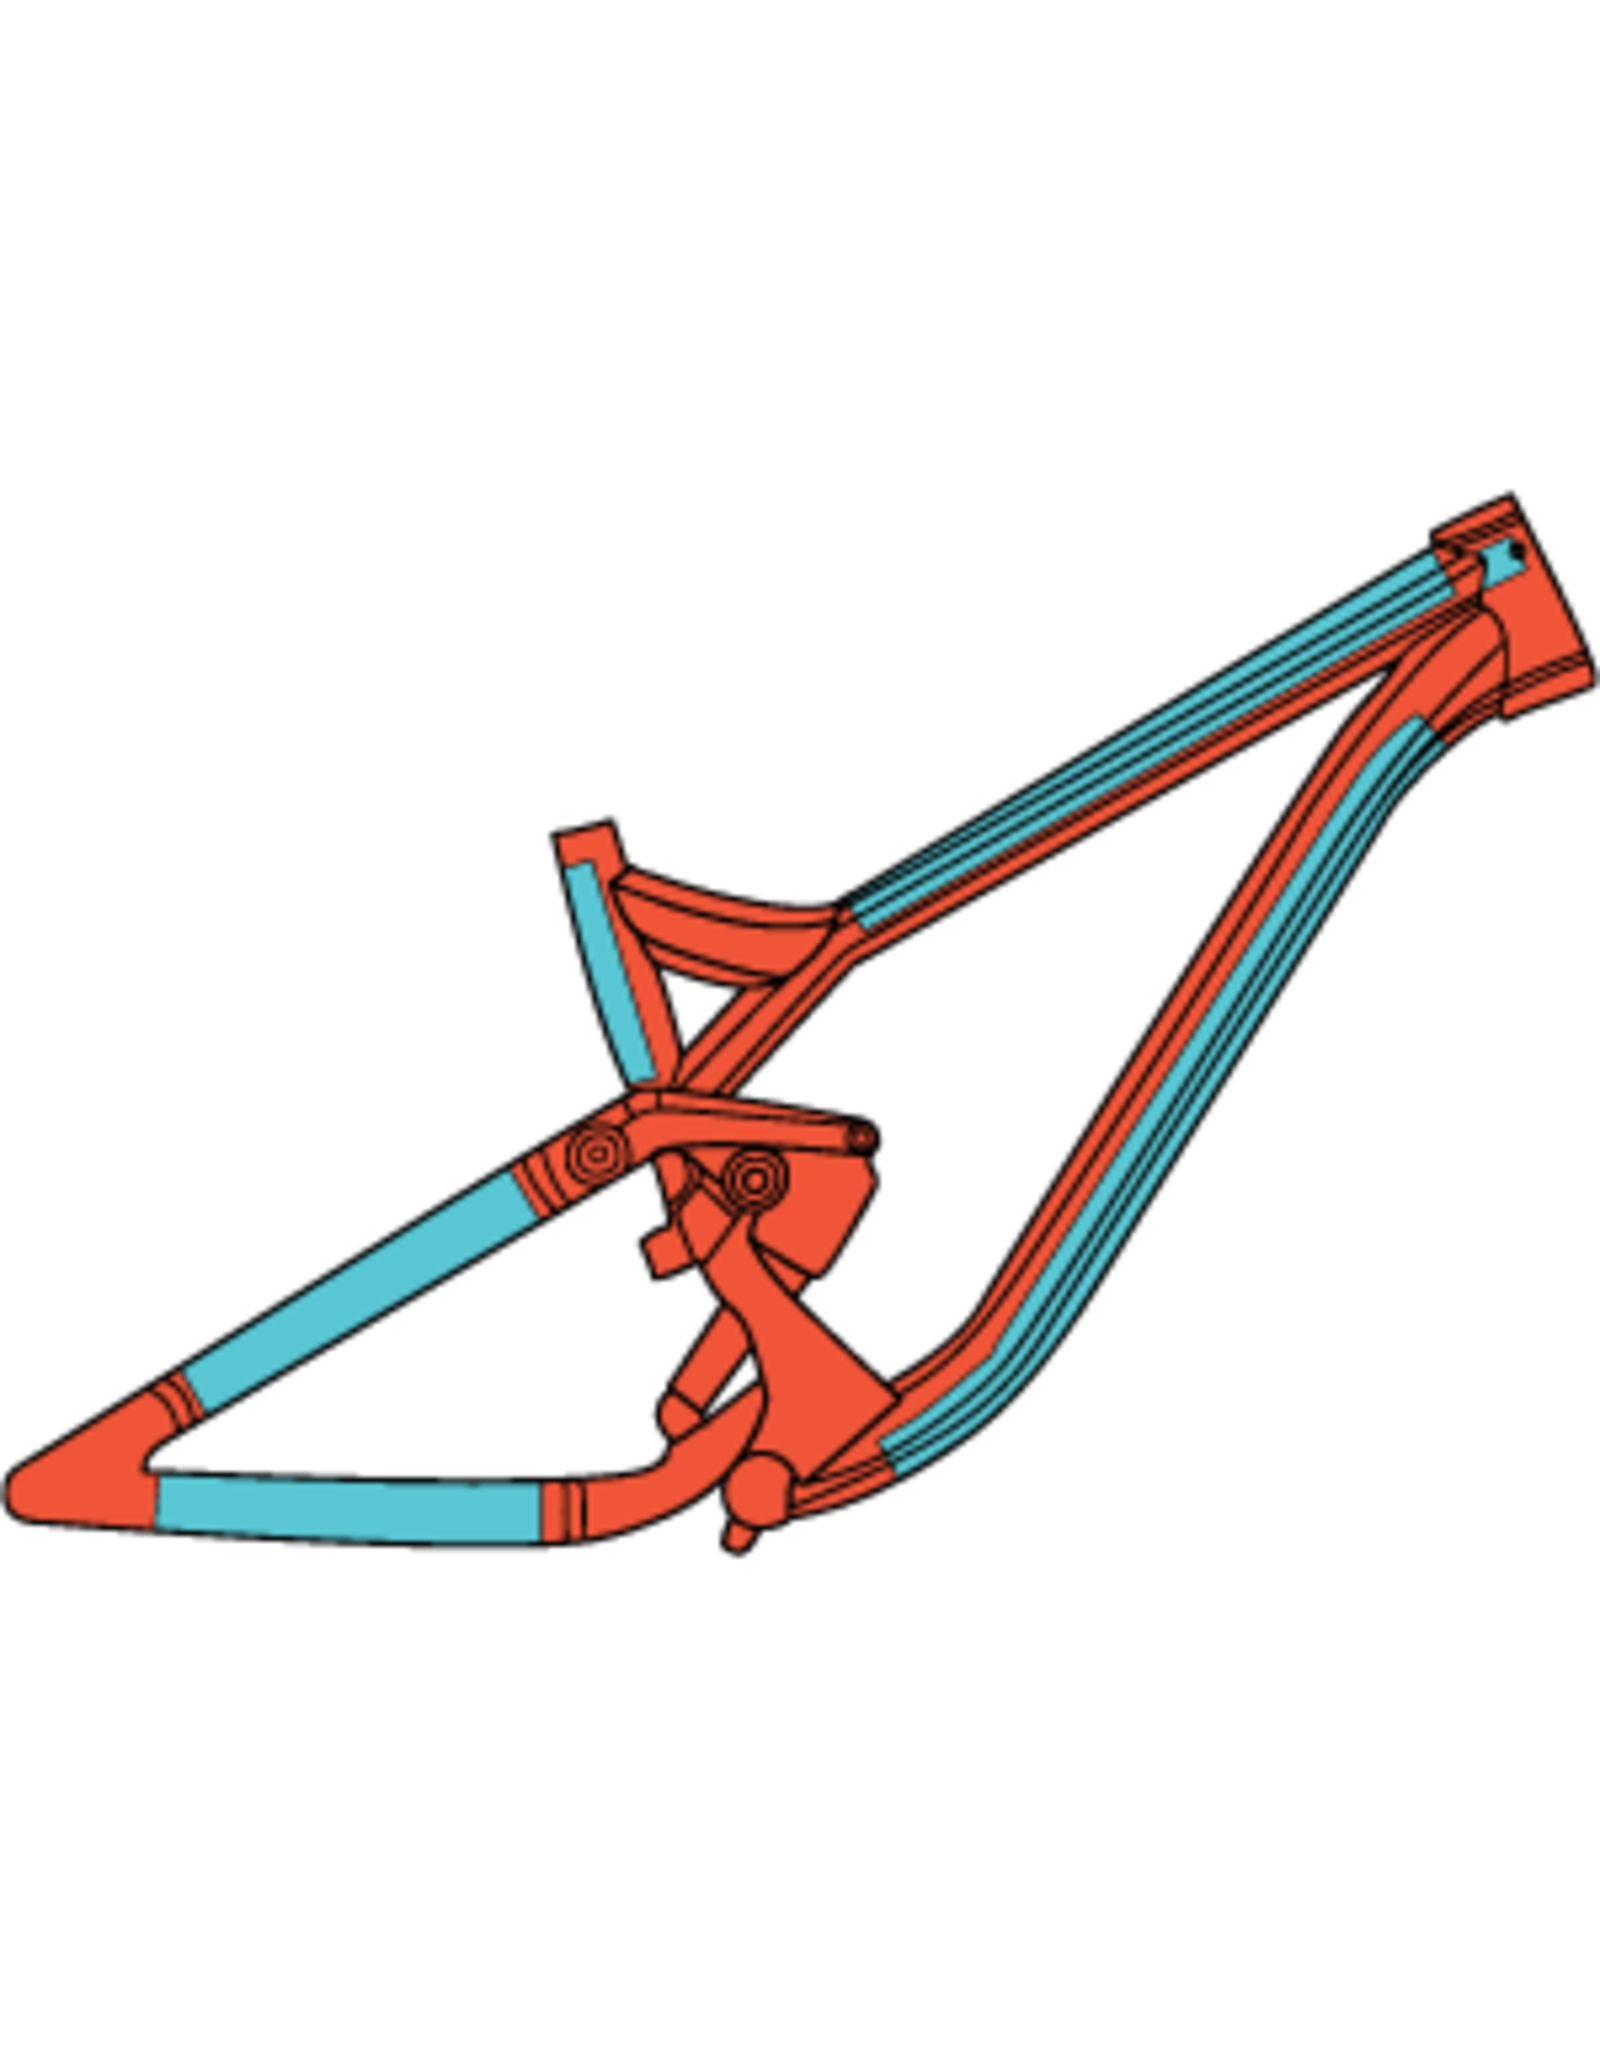 RideWrap RideWrap - Covered MTB, Protective Wrap Kit, Gloss Clear